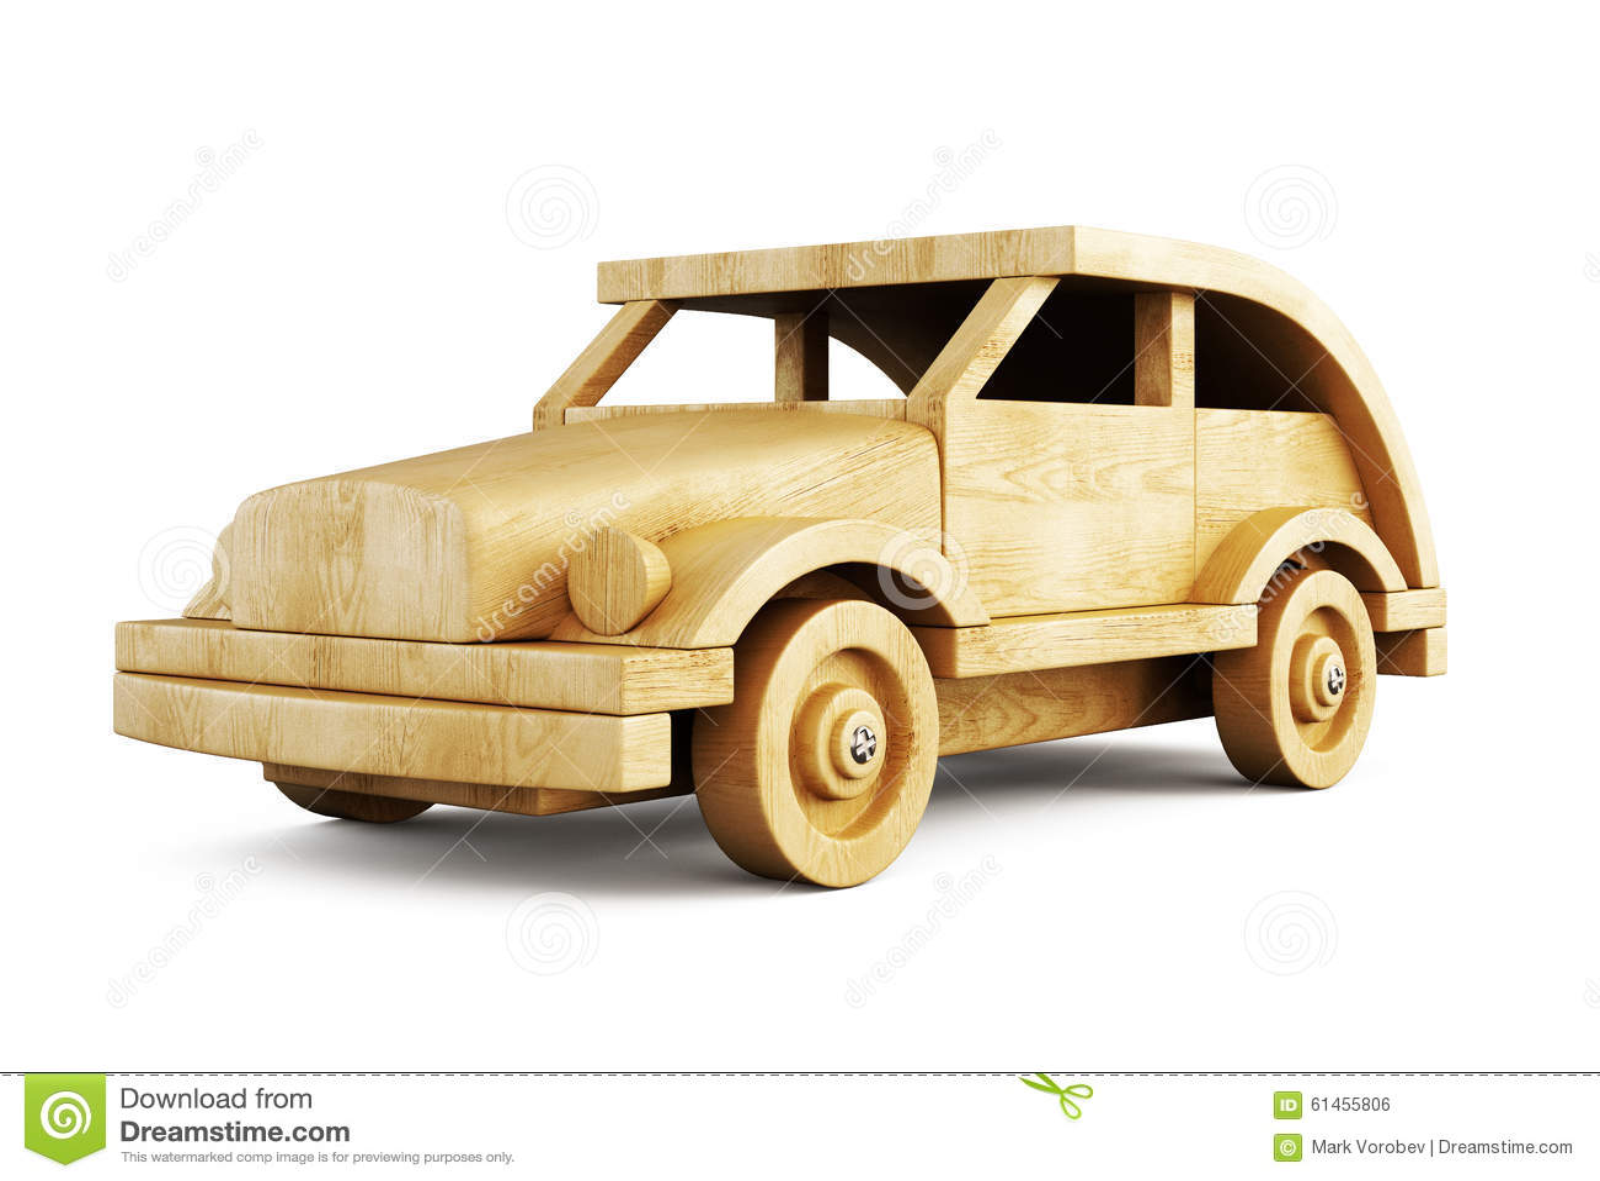 plan rapproch en bois de voiture sur le fond blanc 3d illustration stock image 61455806. Black Bedroom Furniture Sets. Home Design Ideas